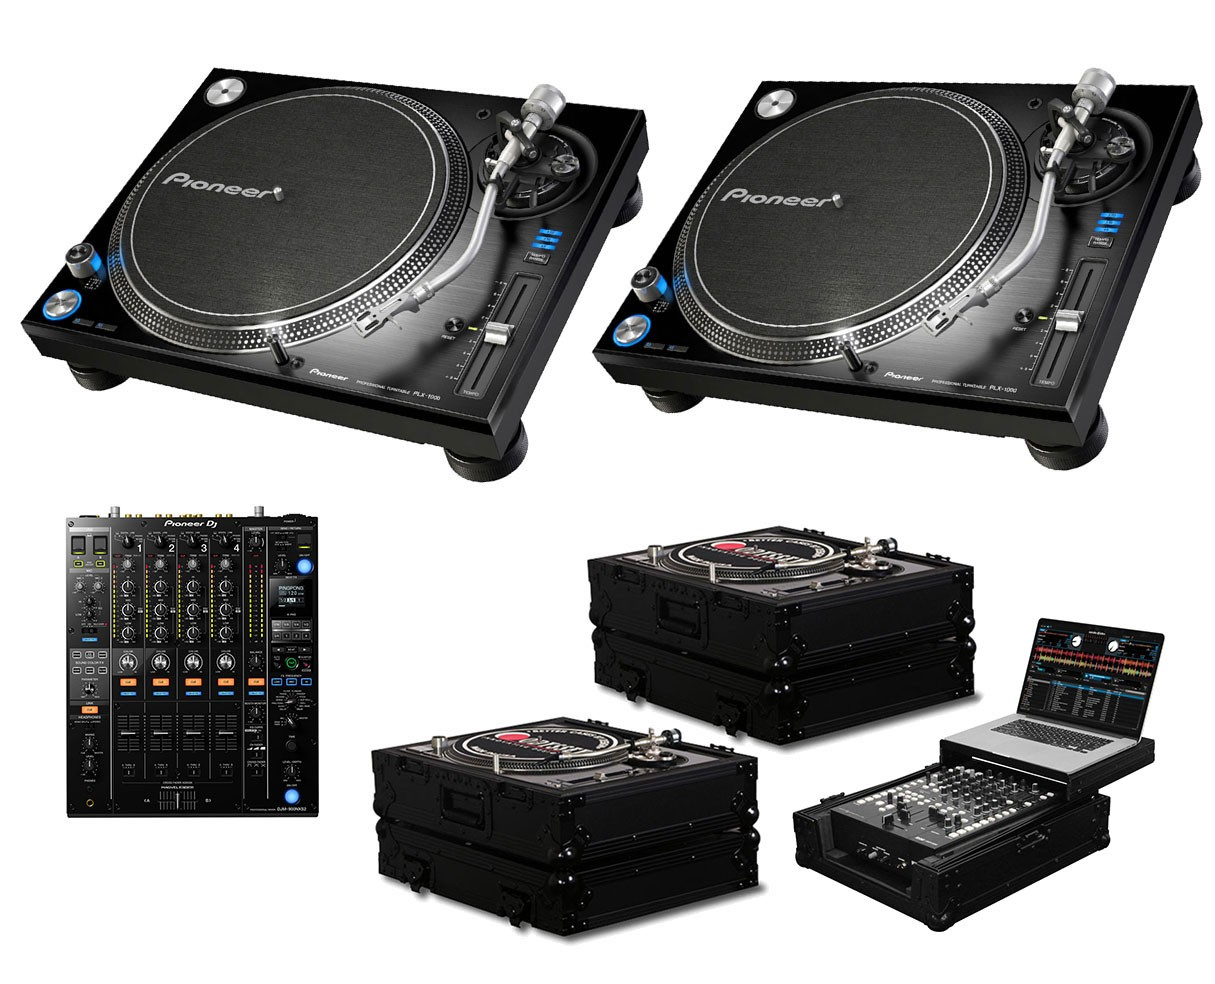 2x Pioneer PLX-1000 + DJM-900 Nexus 2 + Black Label Cases + Glide Style Case